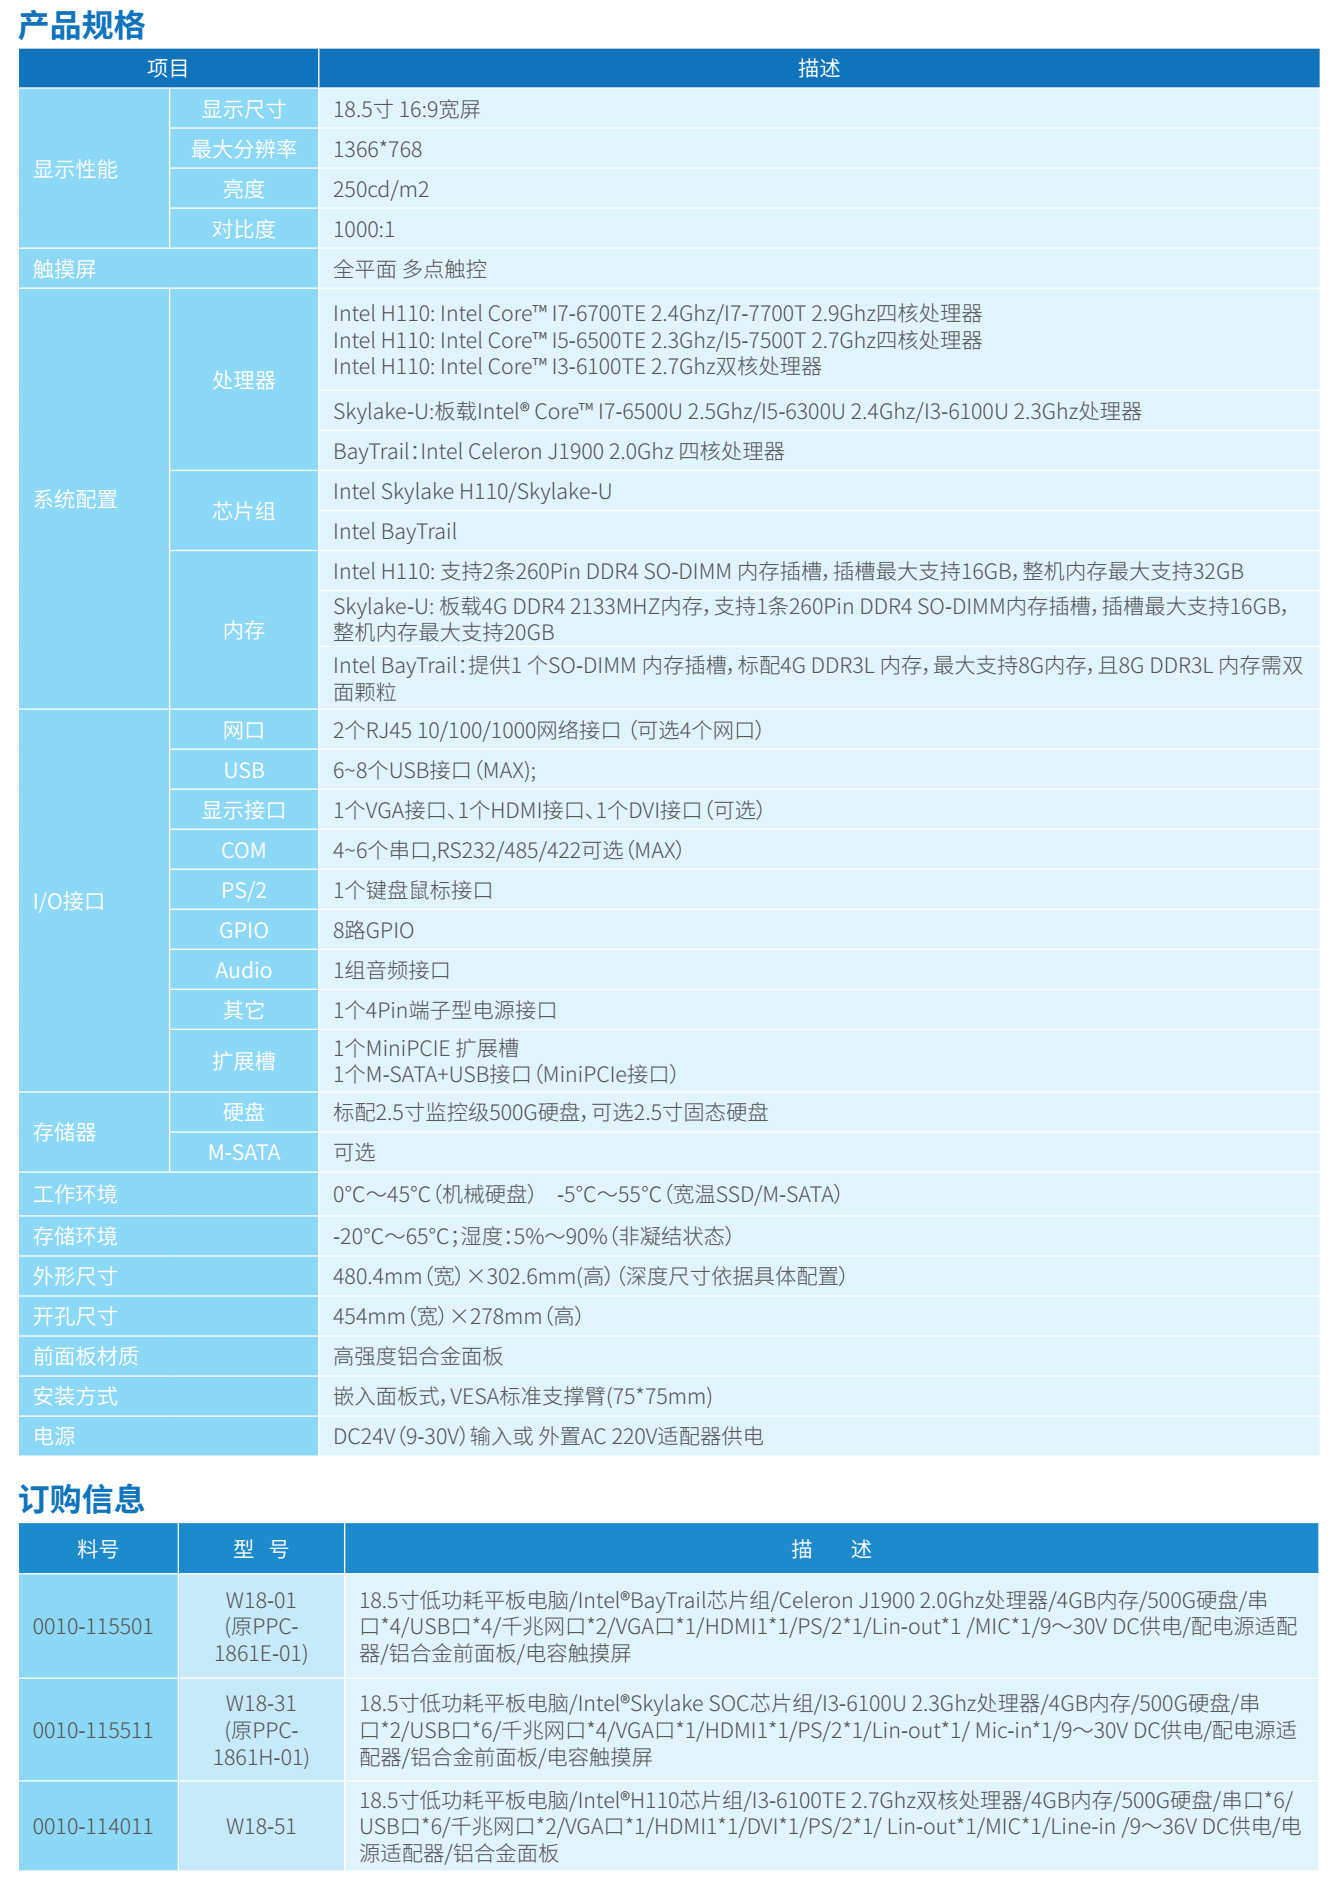 QQ图片20200326164455.png